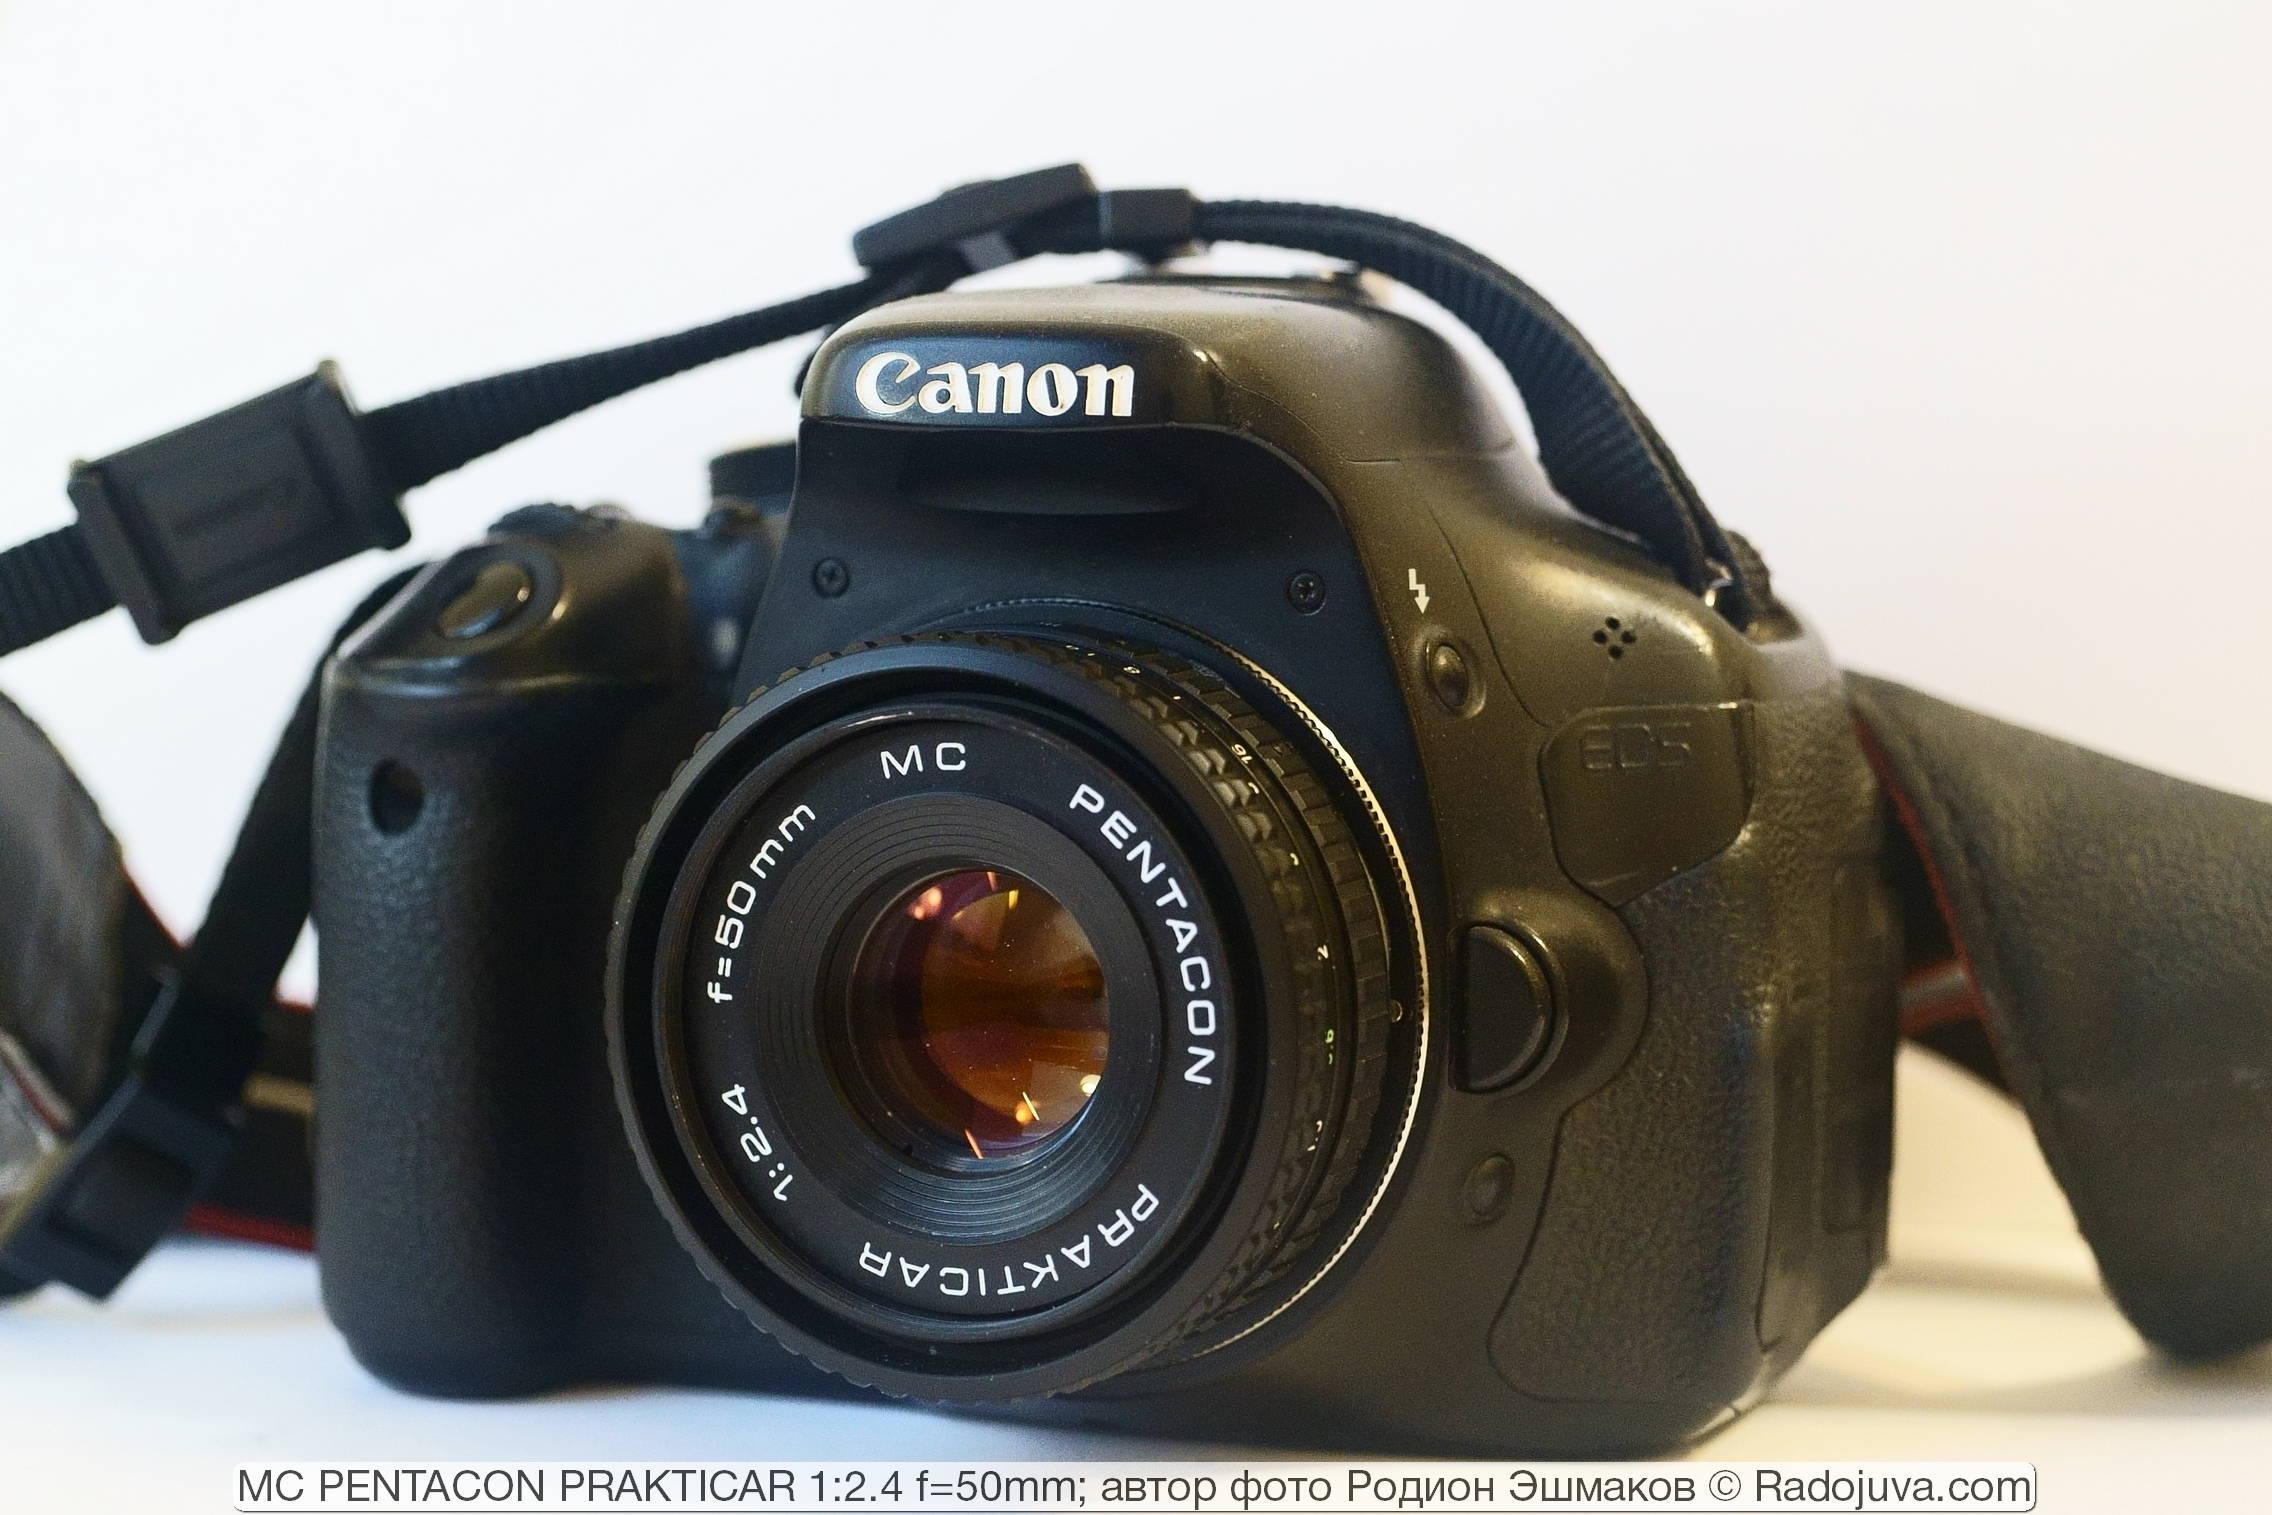 Prakticar 50/2.4 на Canon 600D.